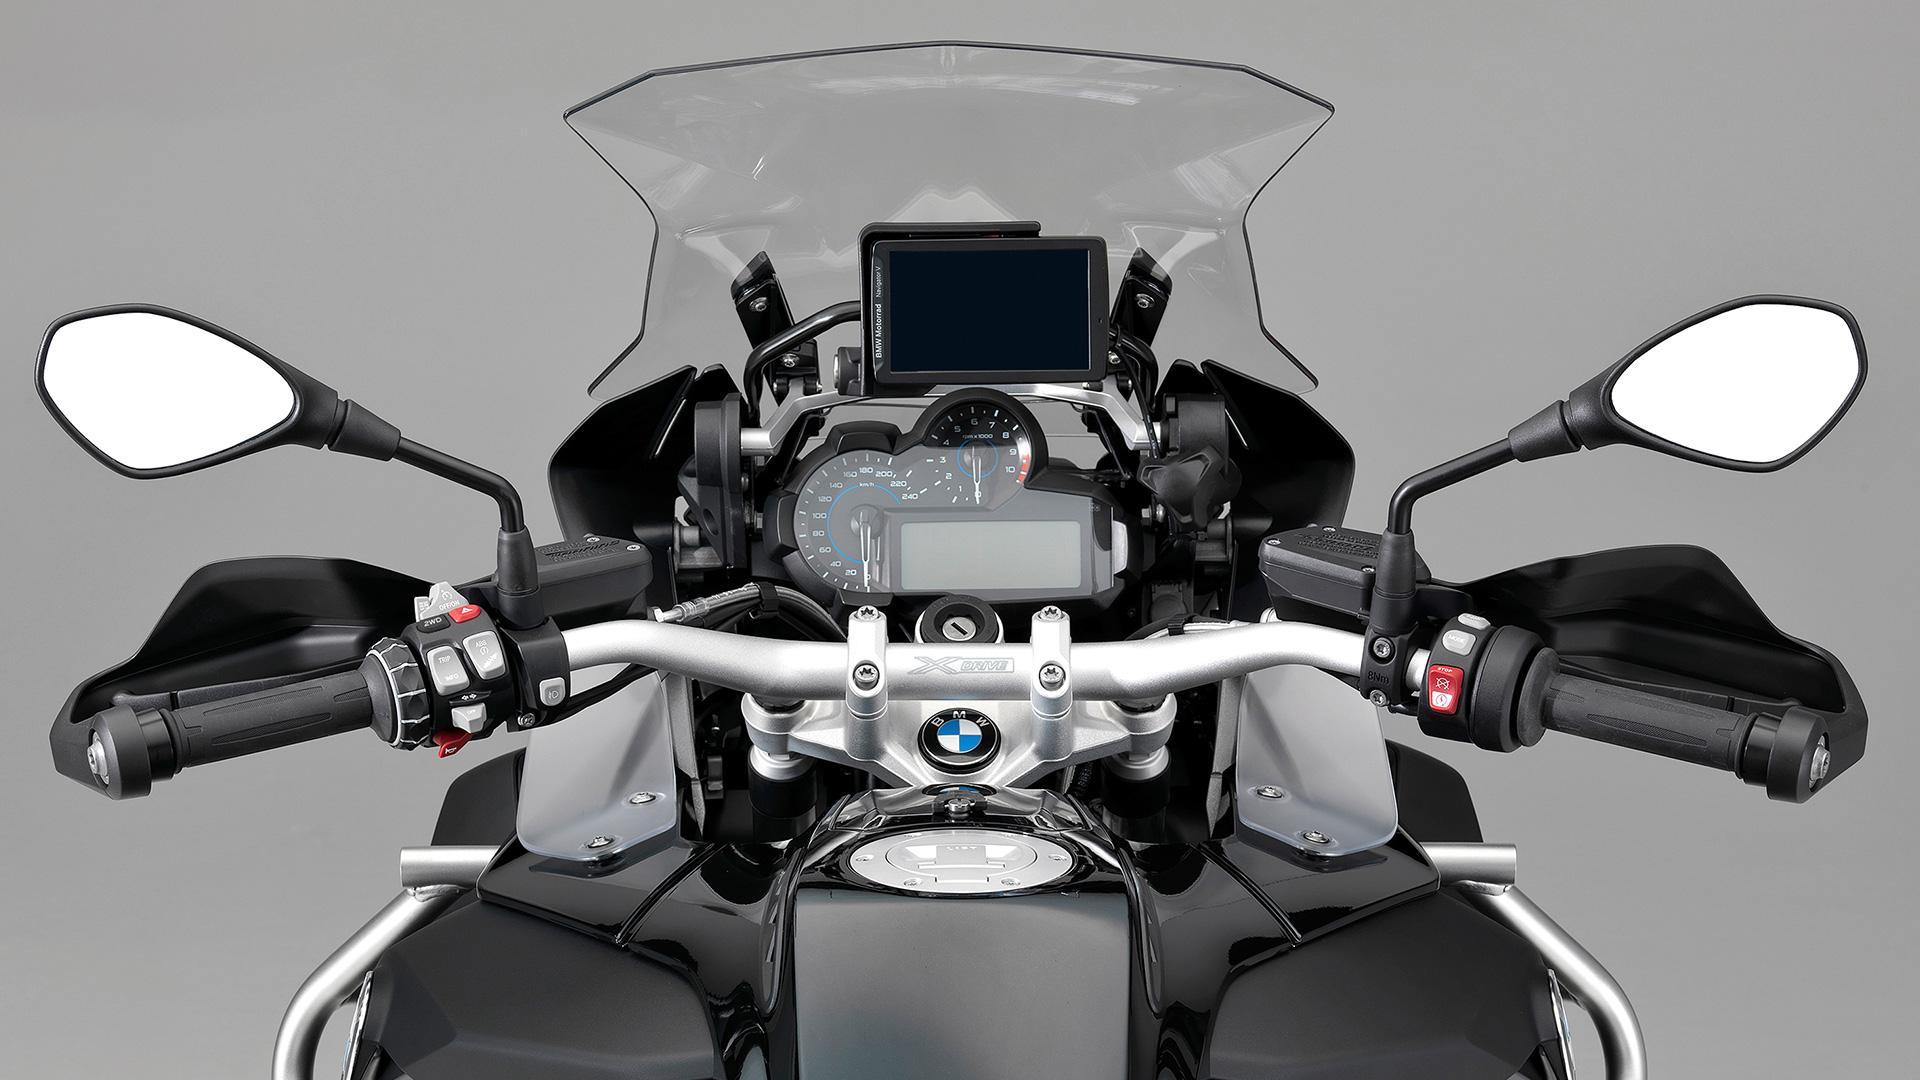 BMW R 1200 GS 2017 Standard